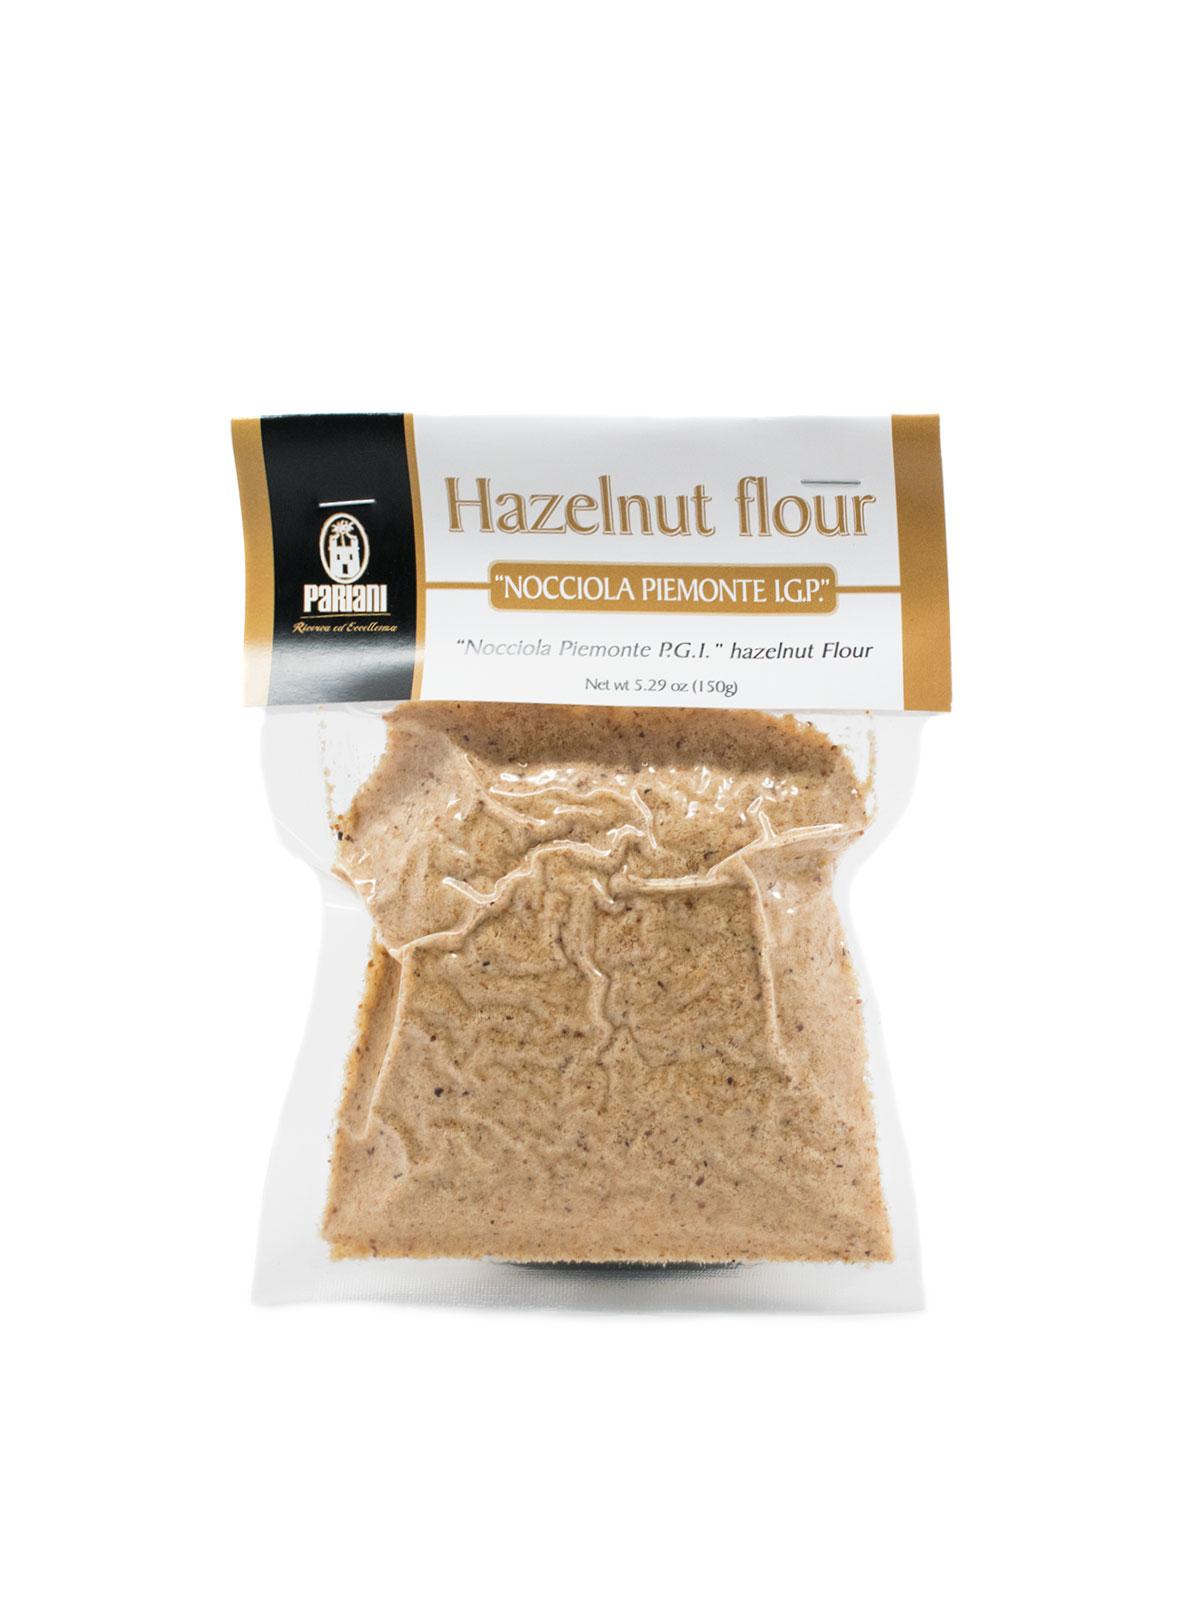 Nocciola Piemonte P.G.I. Hazelnut Flour - Baking Essentials - Buon'Italia